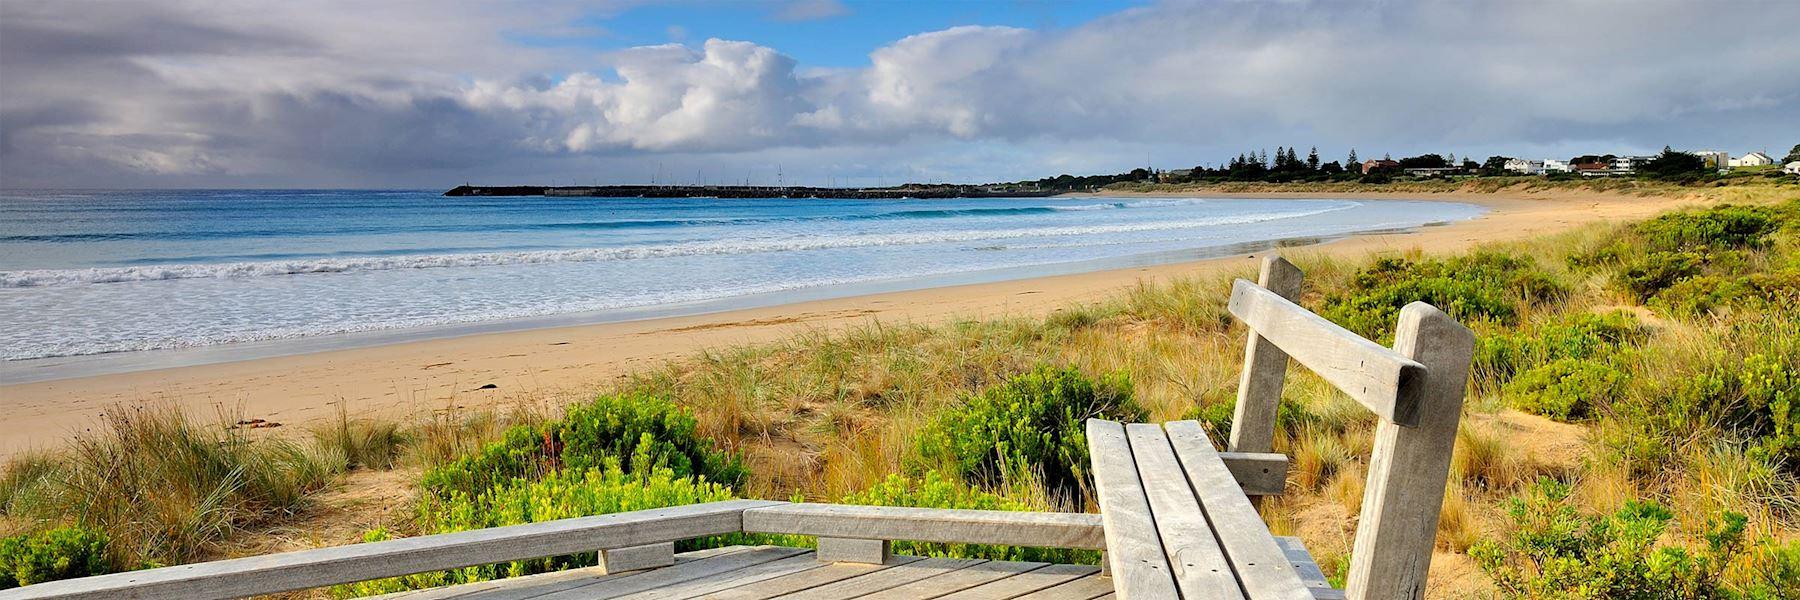 Visit Apollo Bay, Australia